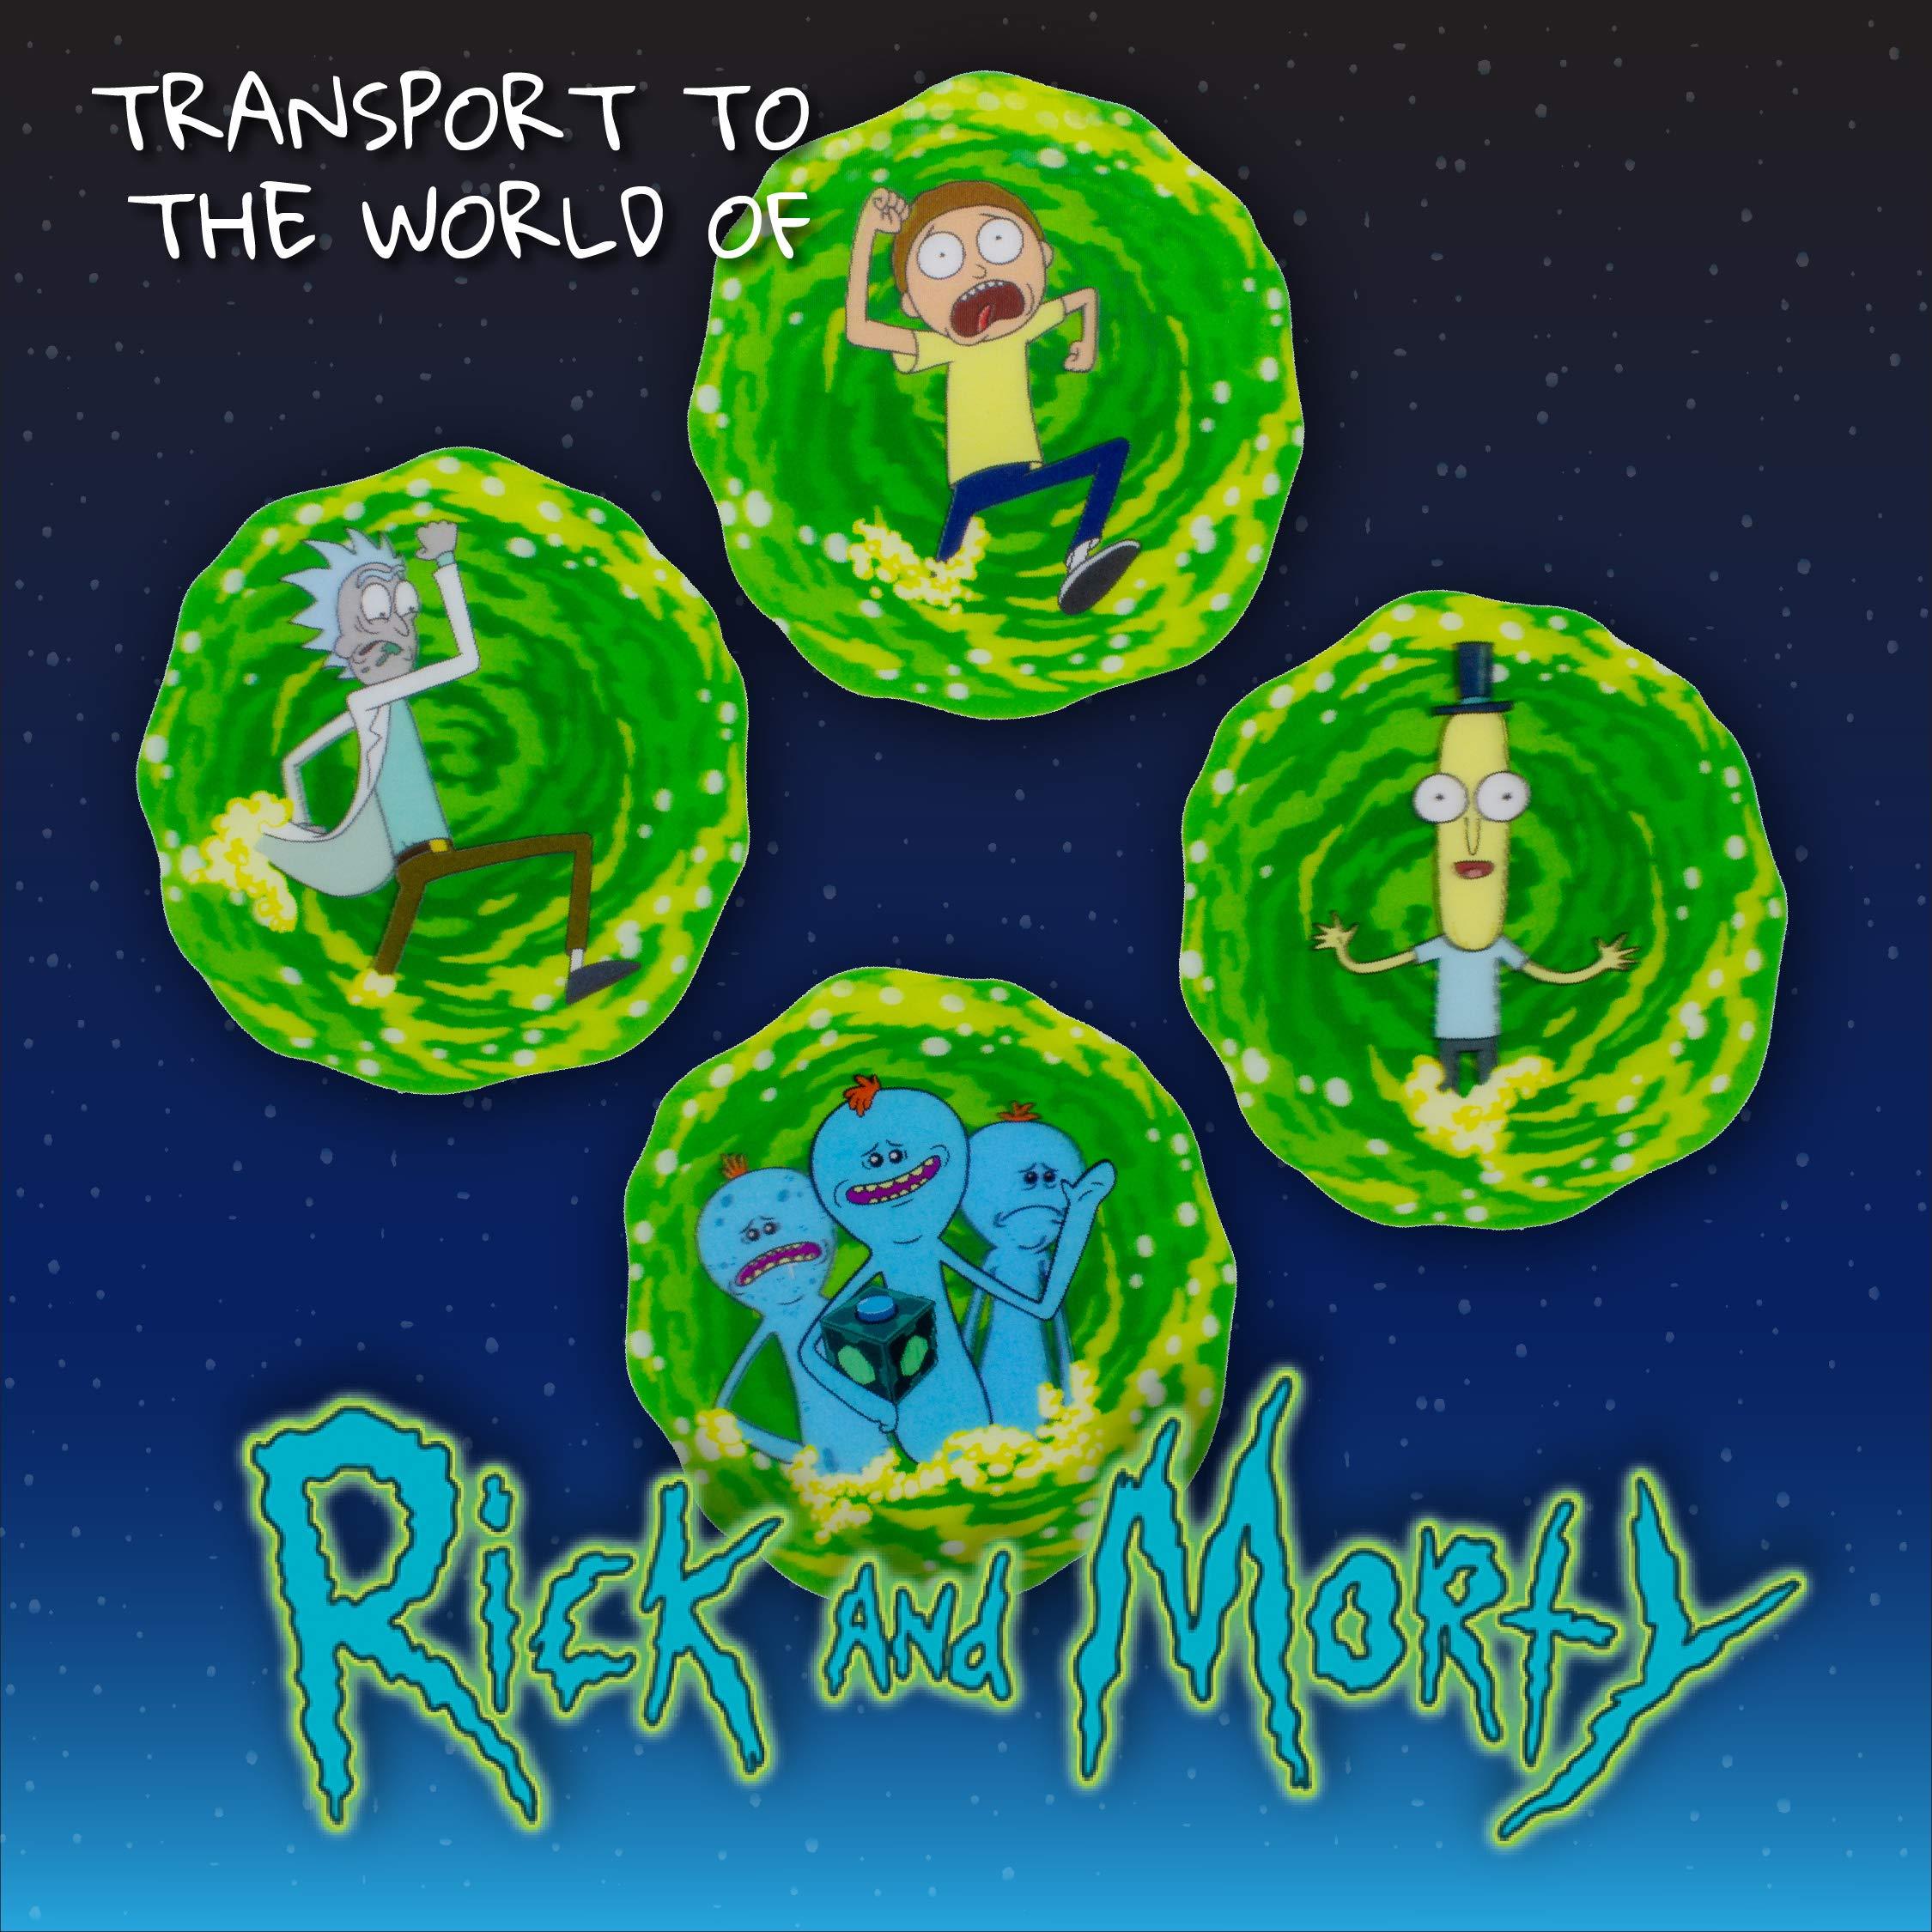 Rick and Morty TV Series Szechaun Sauce Peel Off Image Sticker Decal UNUSED